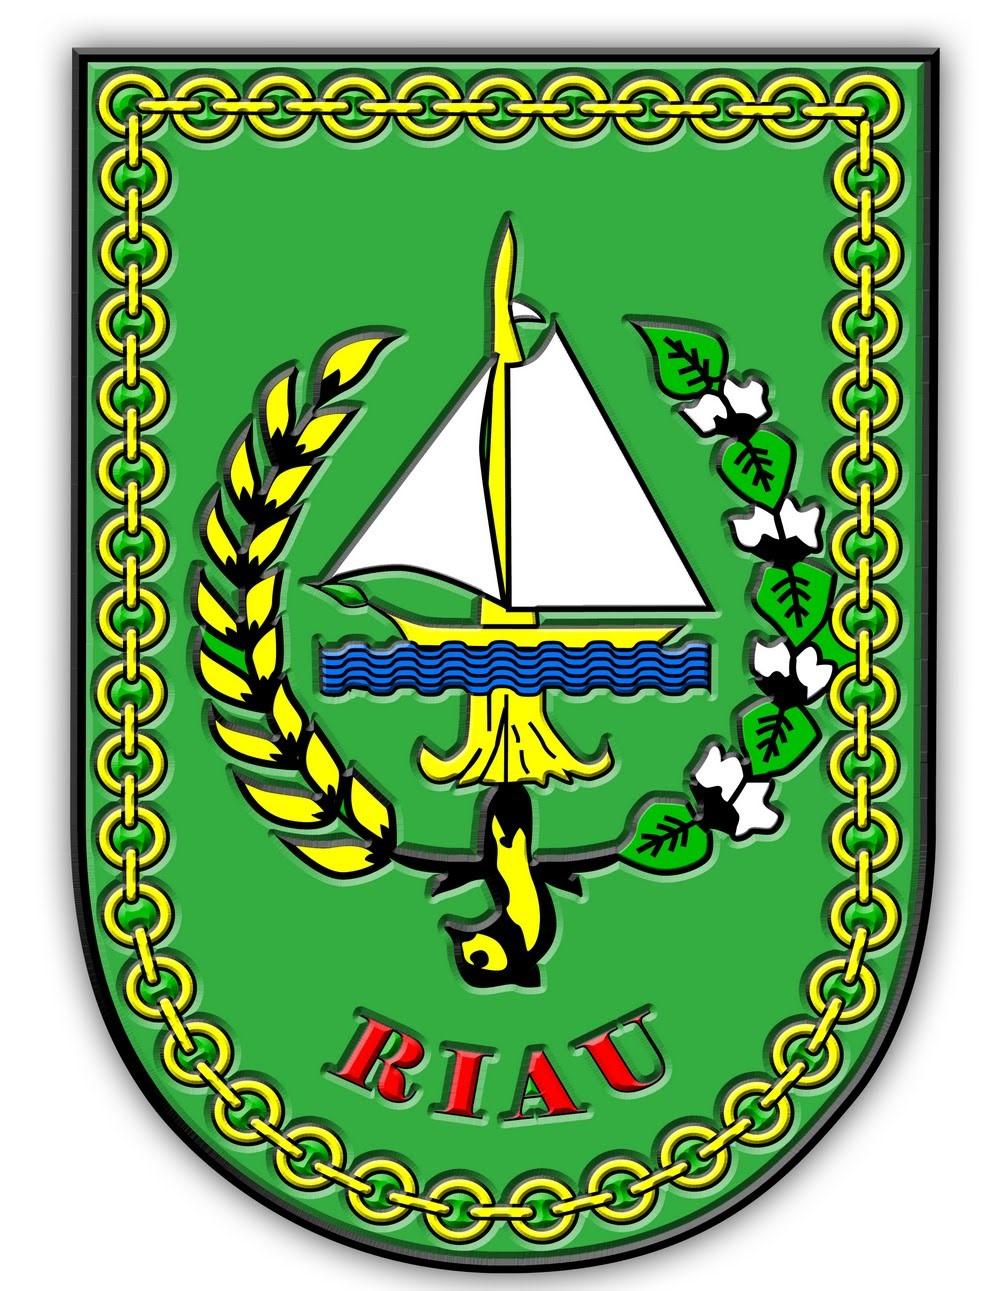 http://rsudarifinachmad.riau.go.id/wp-content/uploads/2021/04/logo-riau.jpg